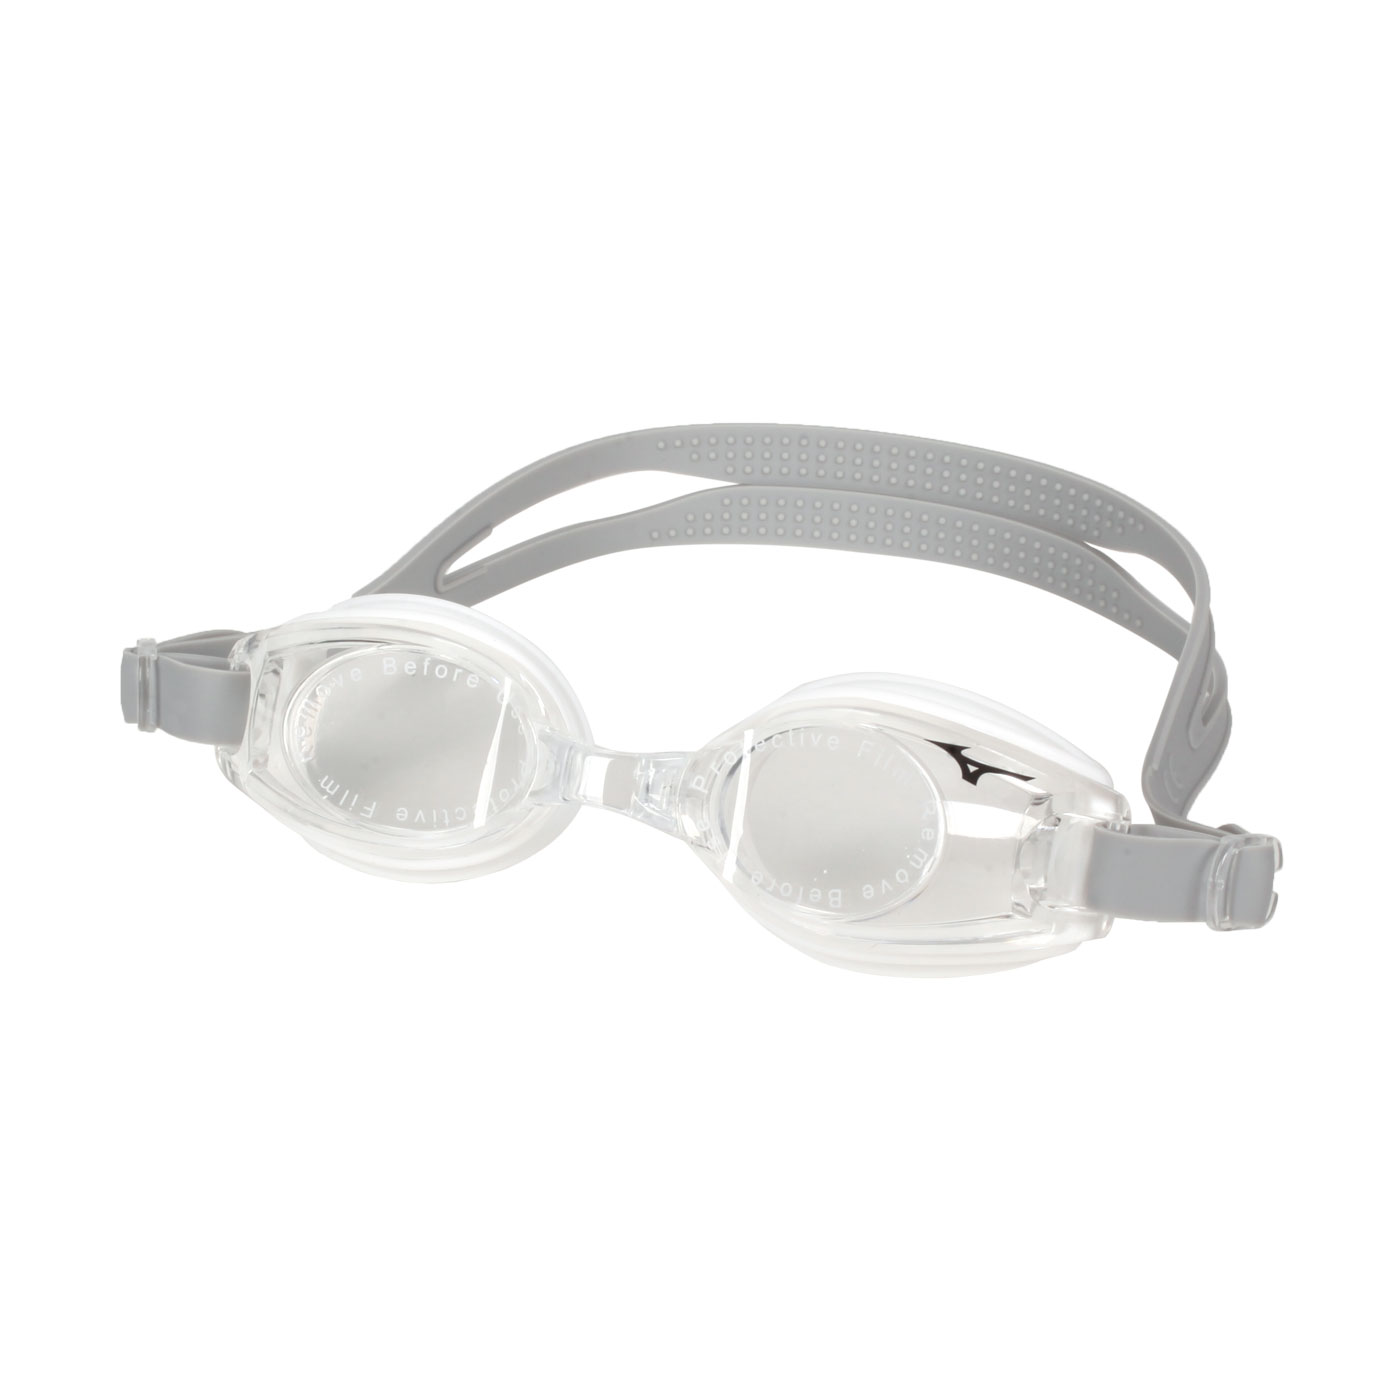 MIZUNO 兒童泳鏡  SWIMN3TF059500-91 - 灰透明白